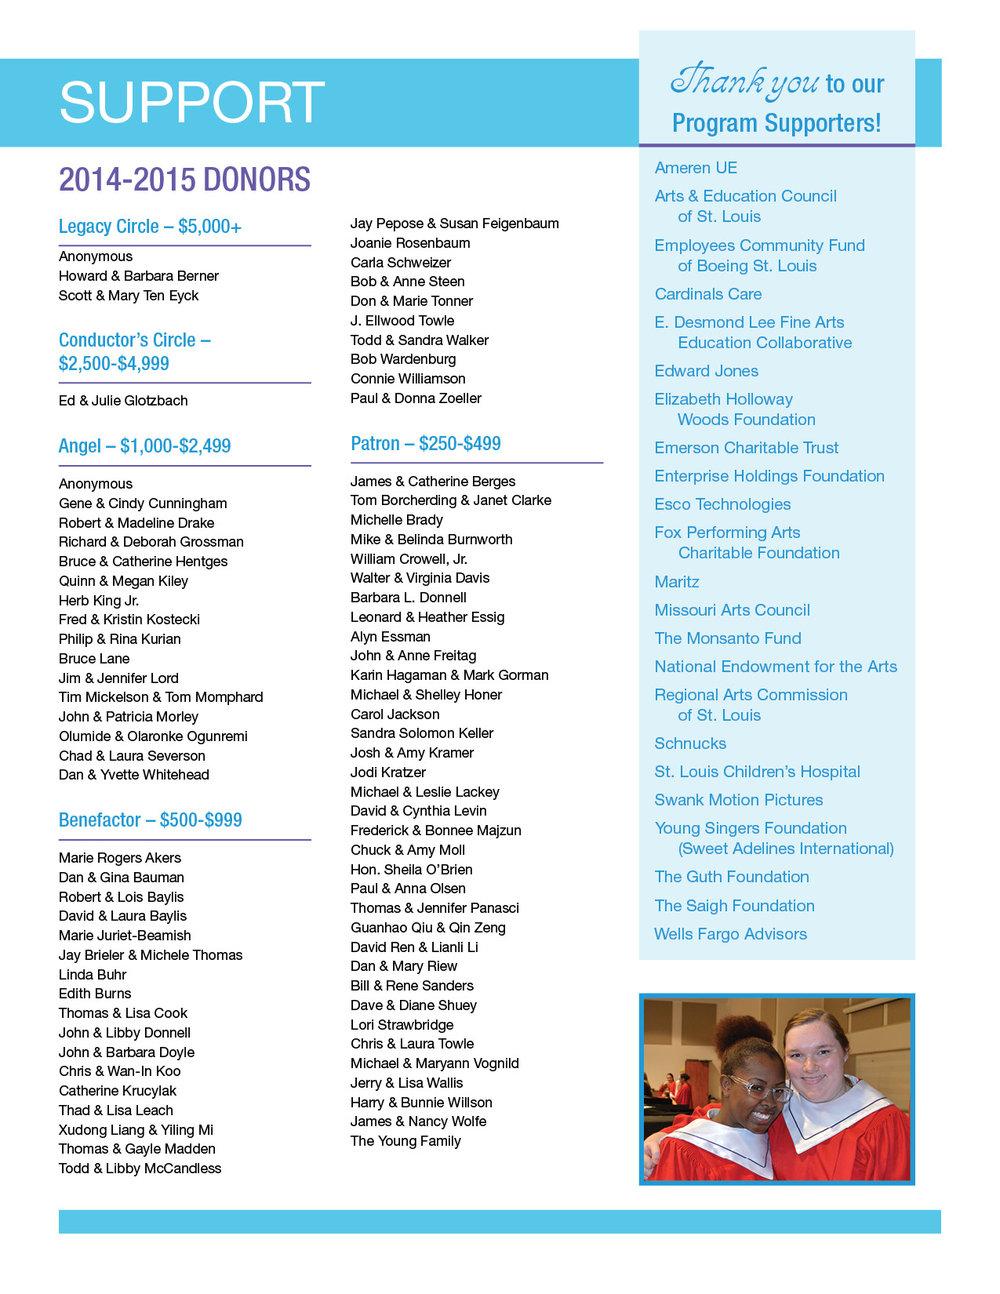 SLCC_Annual Report_2015_V12_hires13.jpg